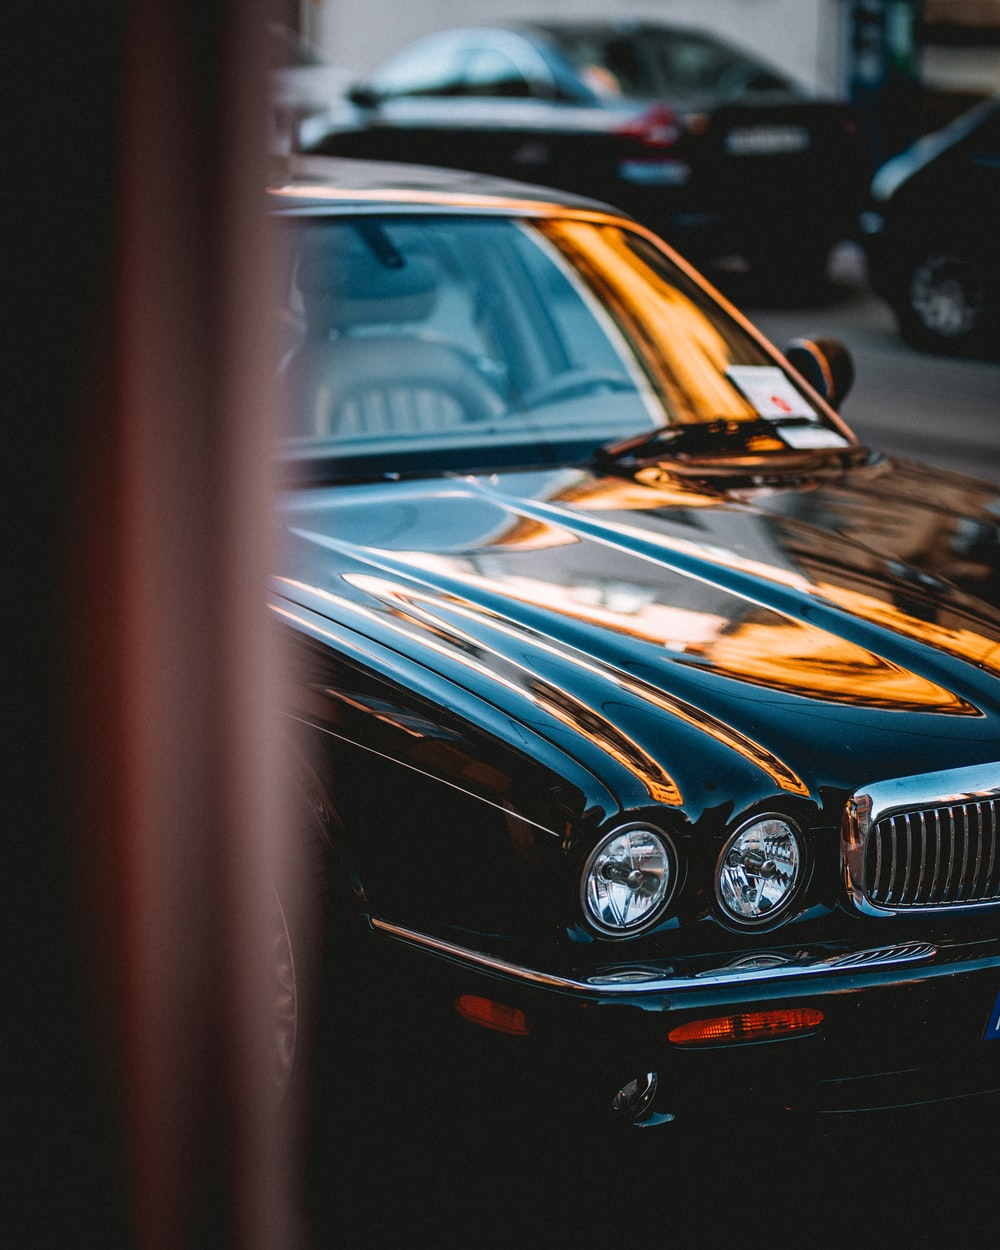 photo of black Jaguar X-type parked near black vehicles